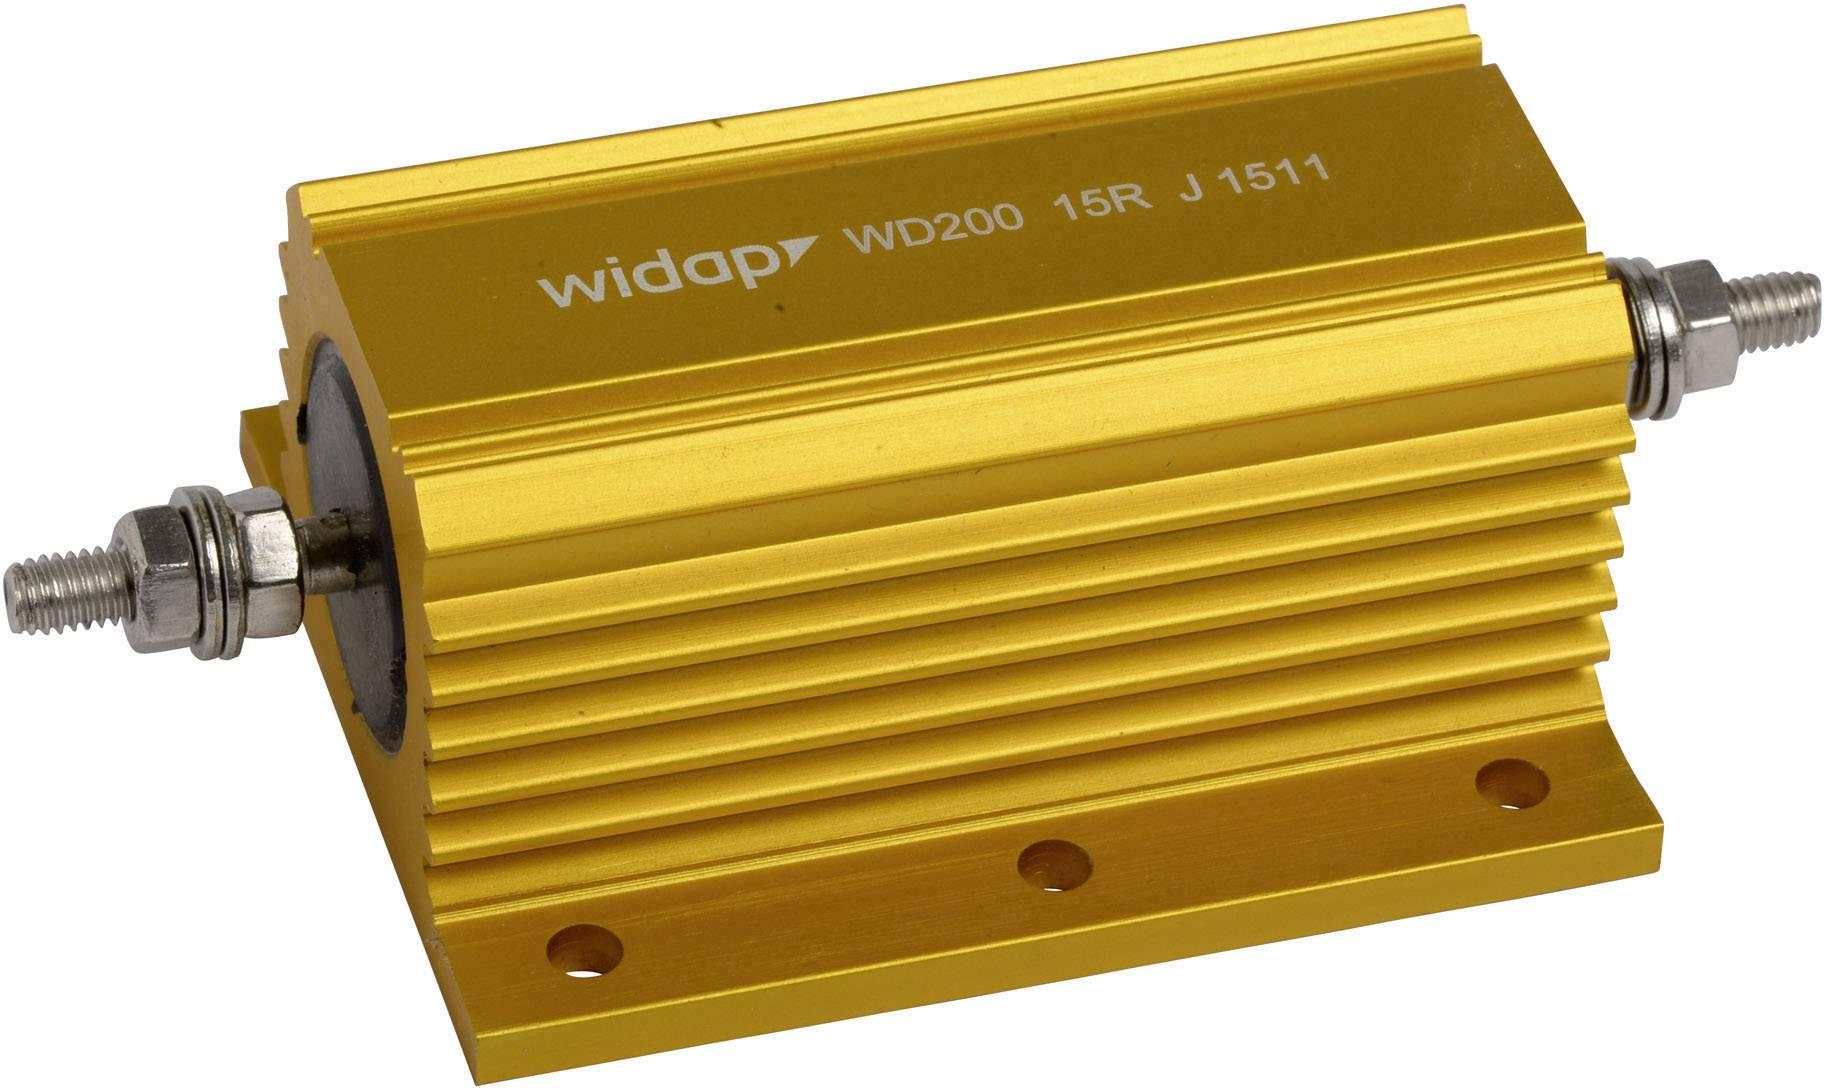 Drôtový rezistor Widap 160184, hodnota odporu 680 Ohm, 300 W, 1 ks